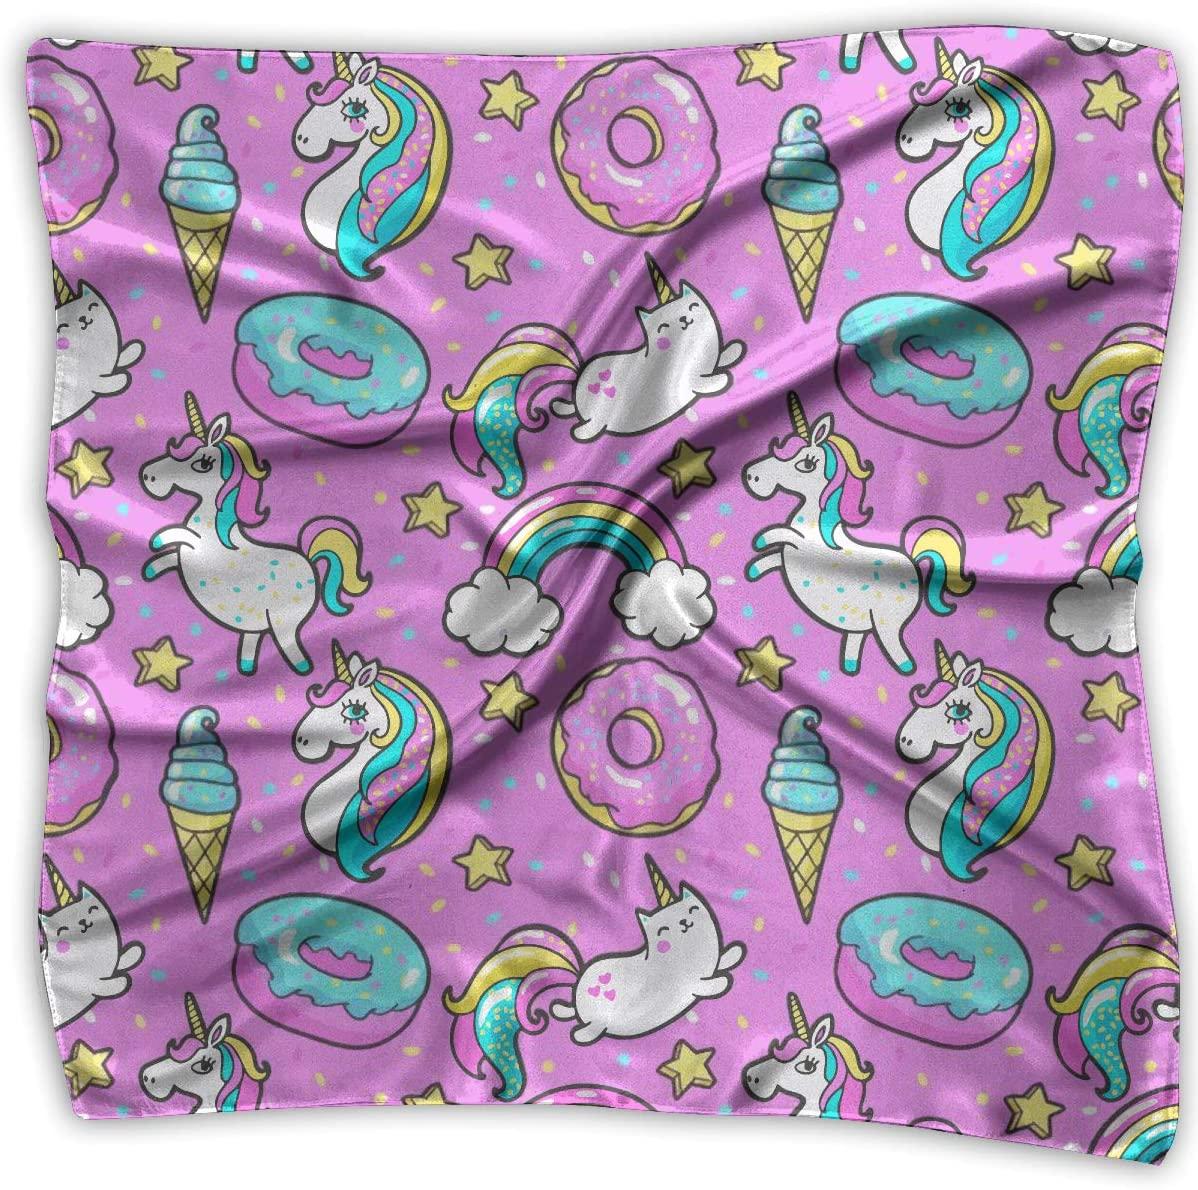 WFIRE Cute Unicorn Square Handkerchiefs Scarf Shawl Bandanas Headscarf Neckerchief Tie Hair Scarf